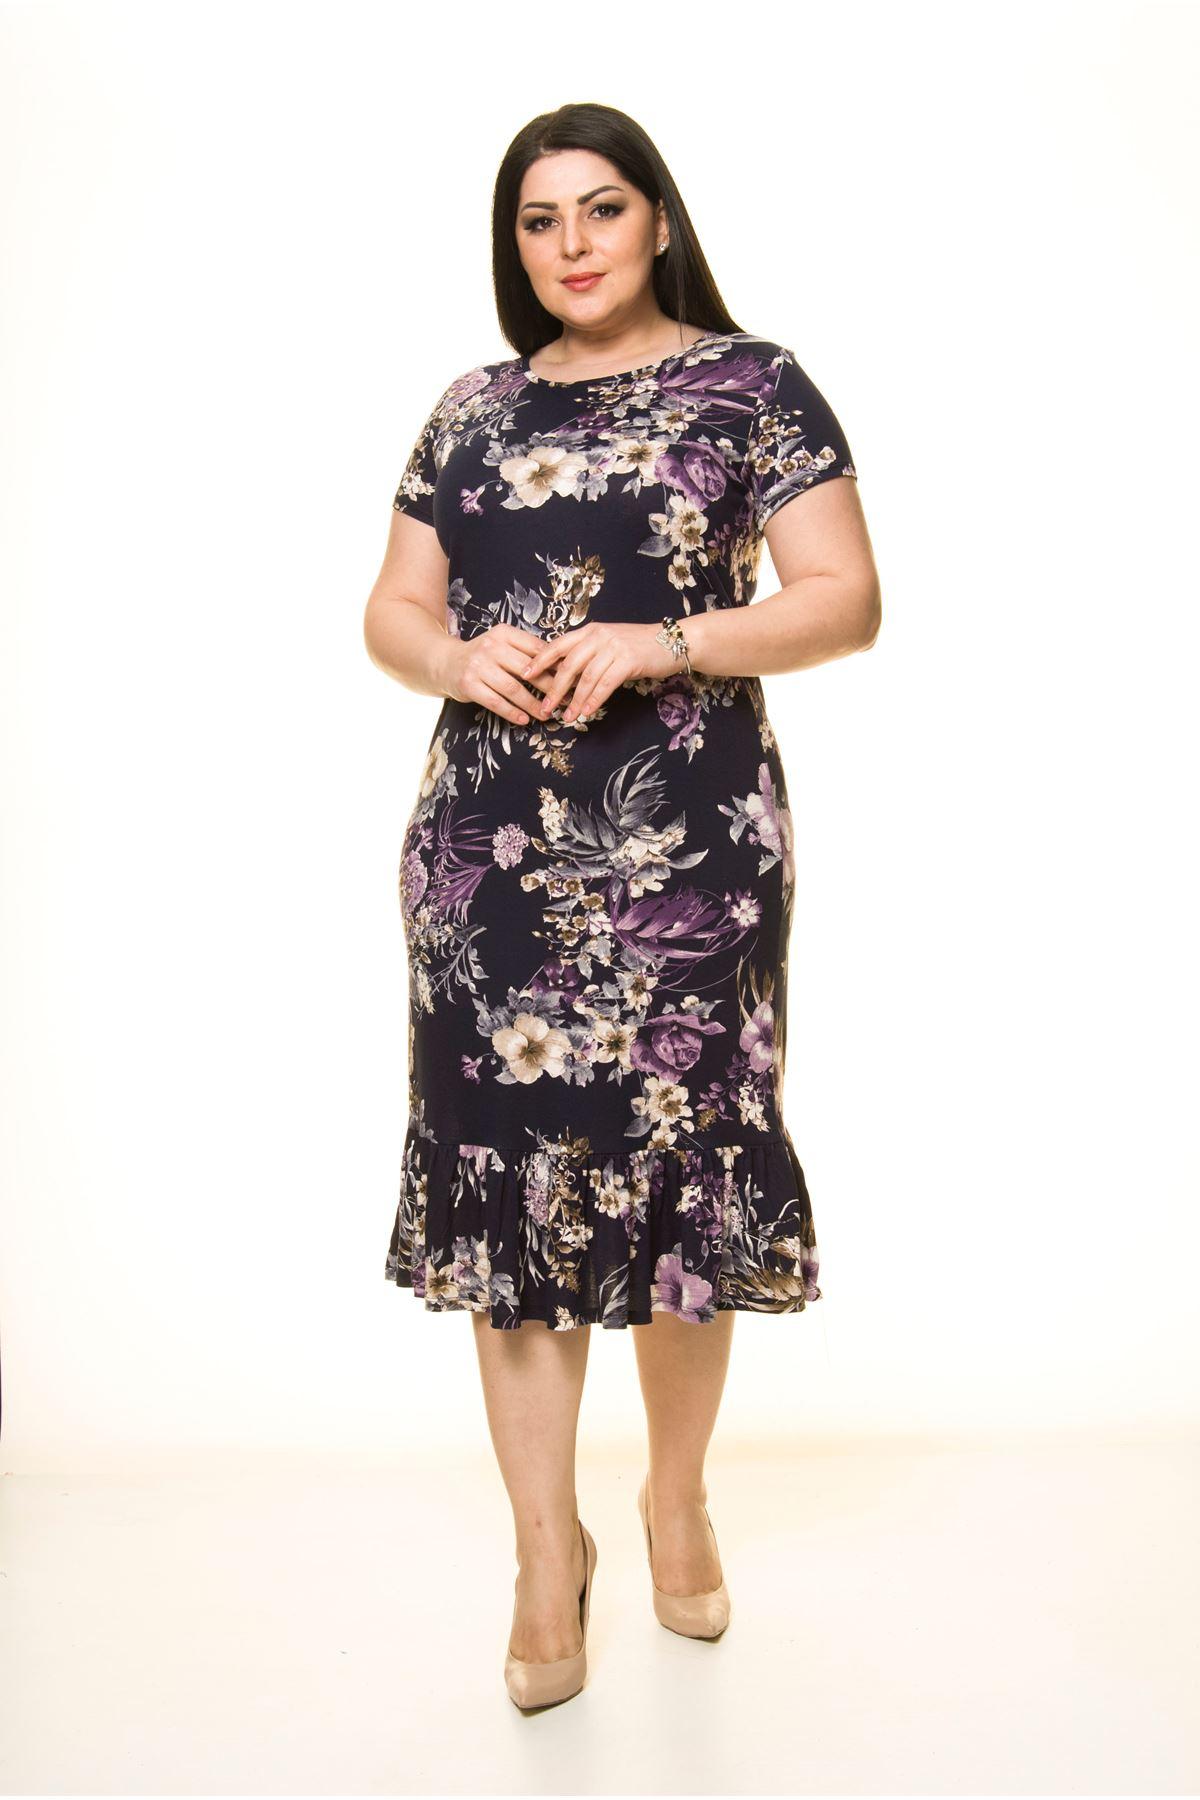 Lacivert Desenli Büyük Beden Elbise 1D-1743